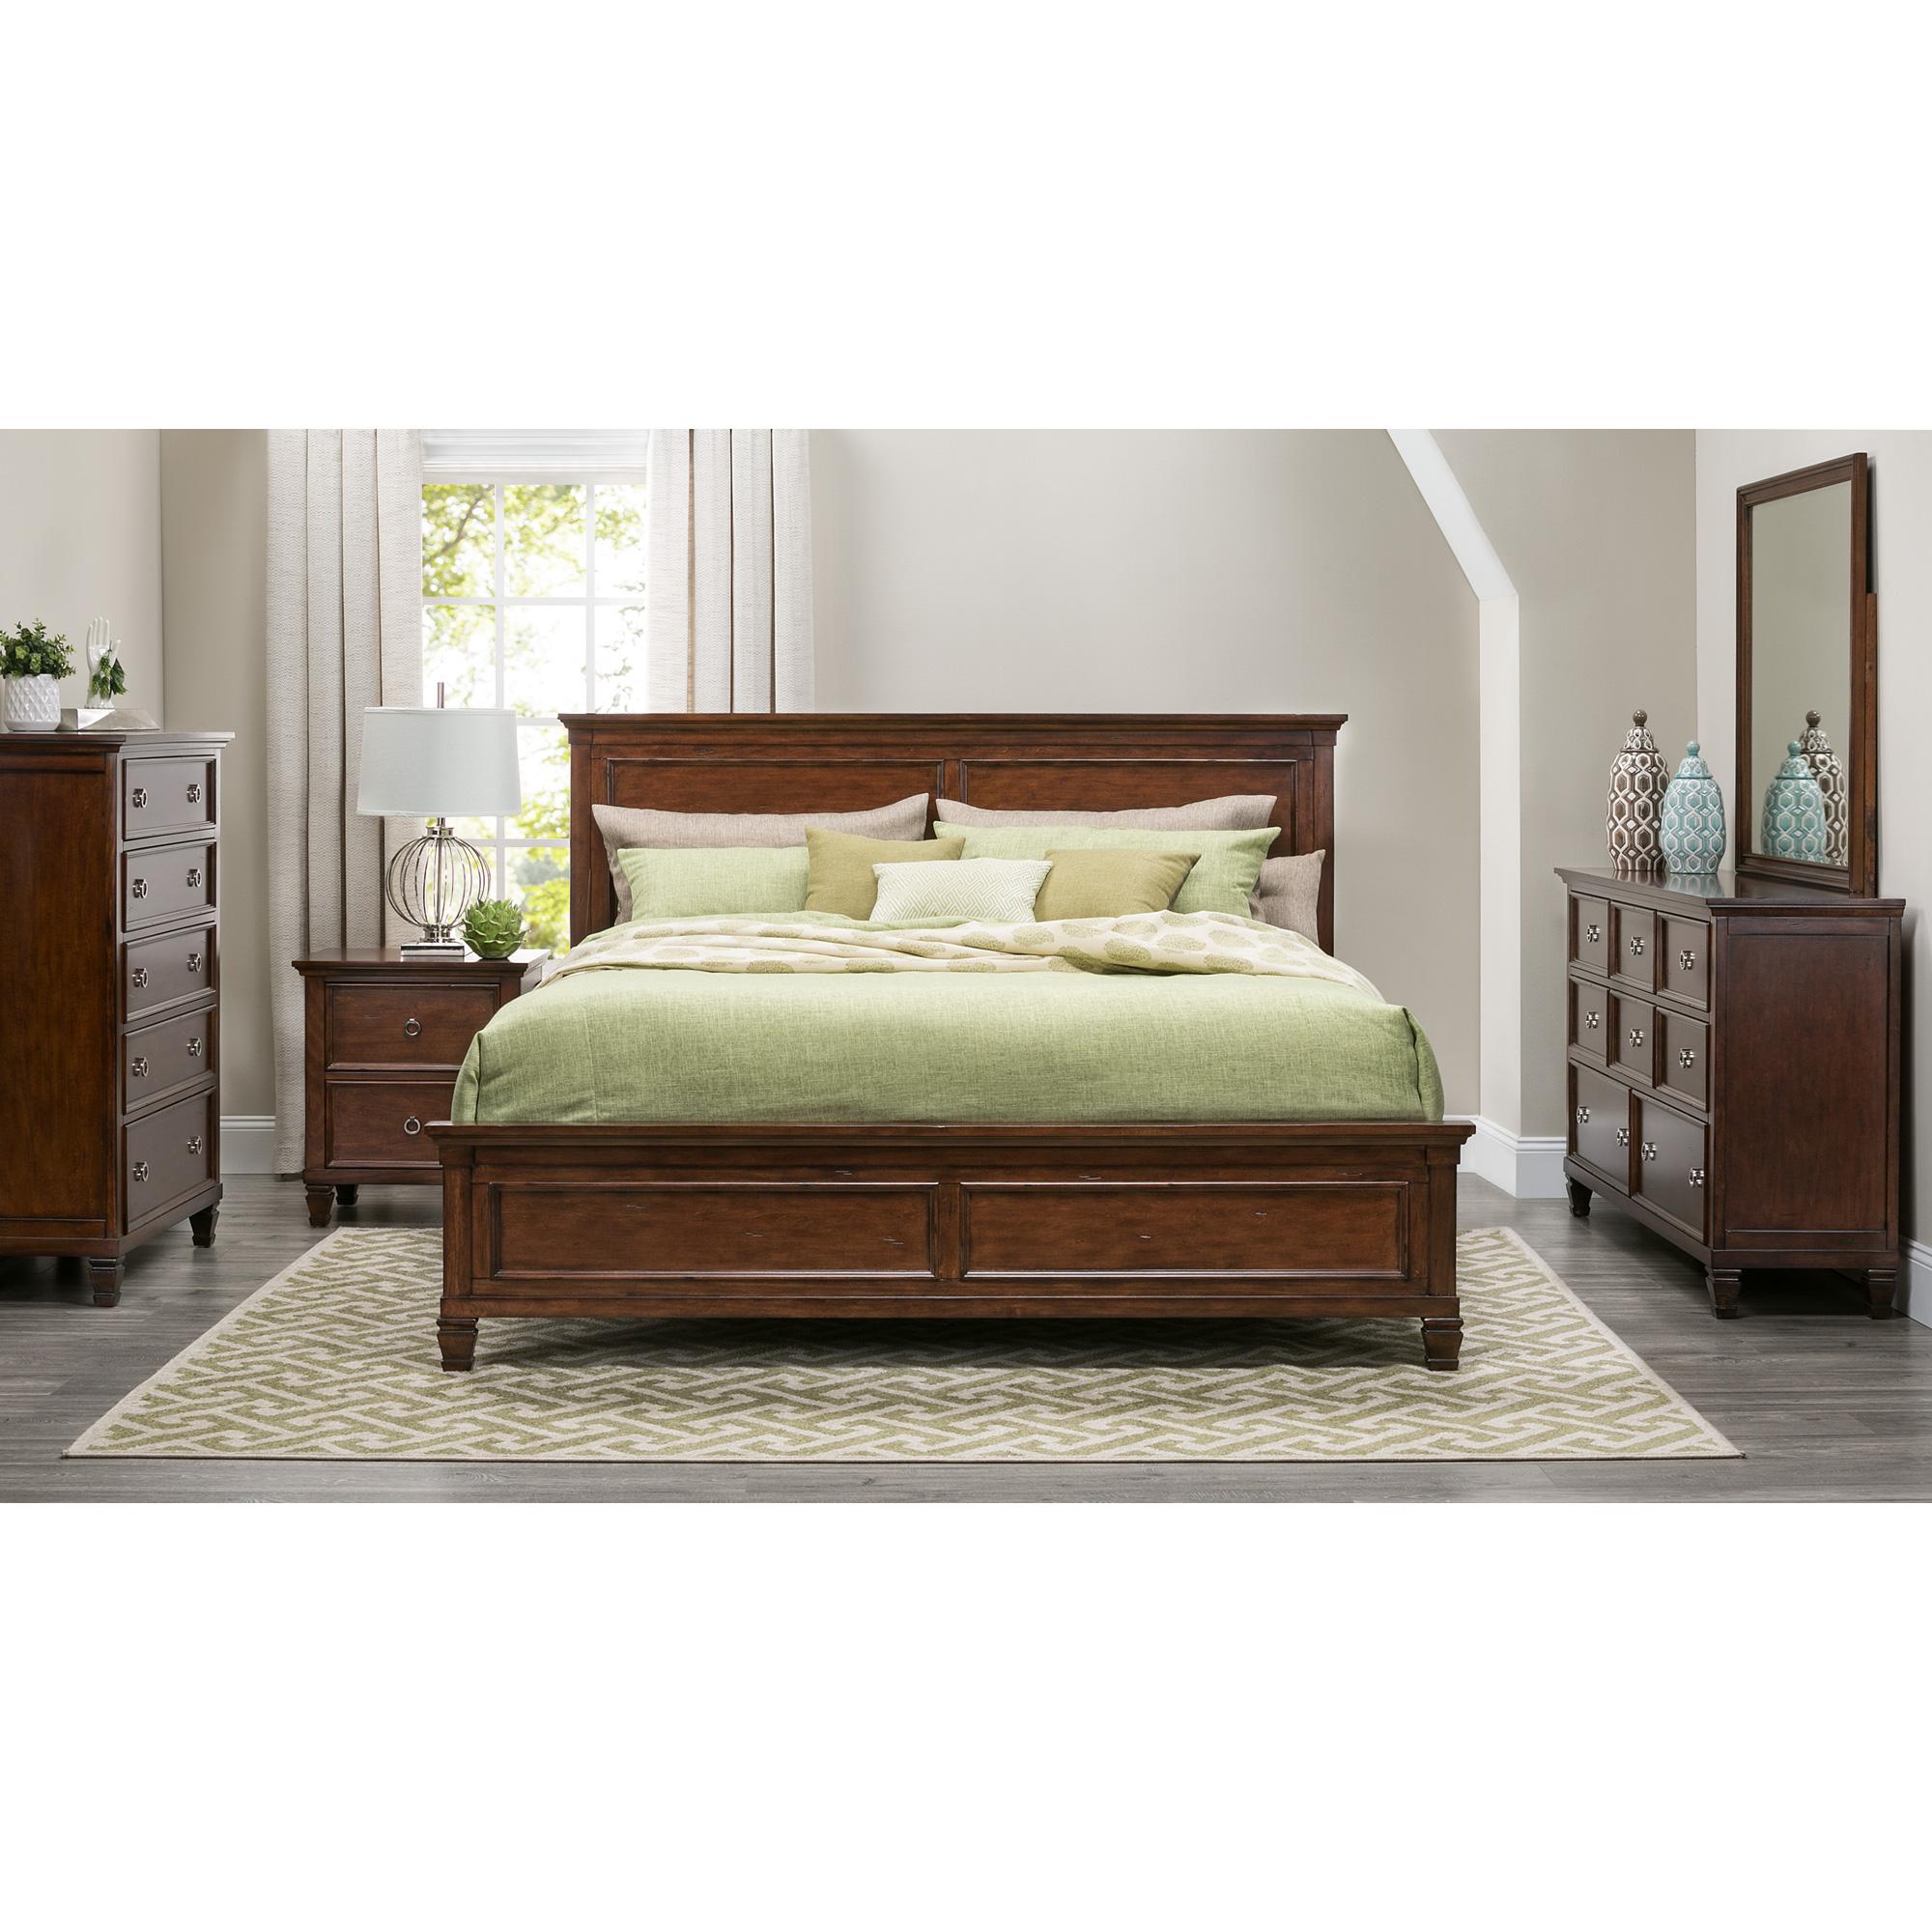 New Classic | Persia II Brown Cherry Full 4 Piece Room Group Bedroom Set